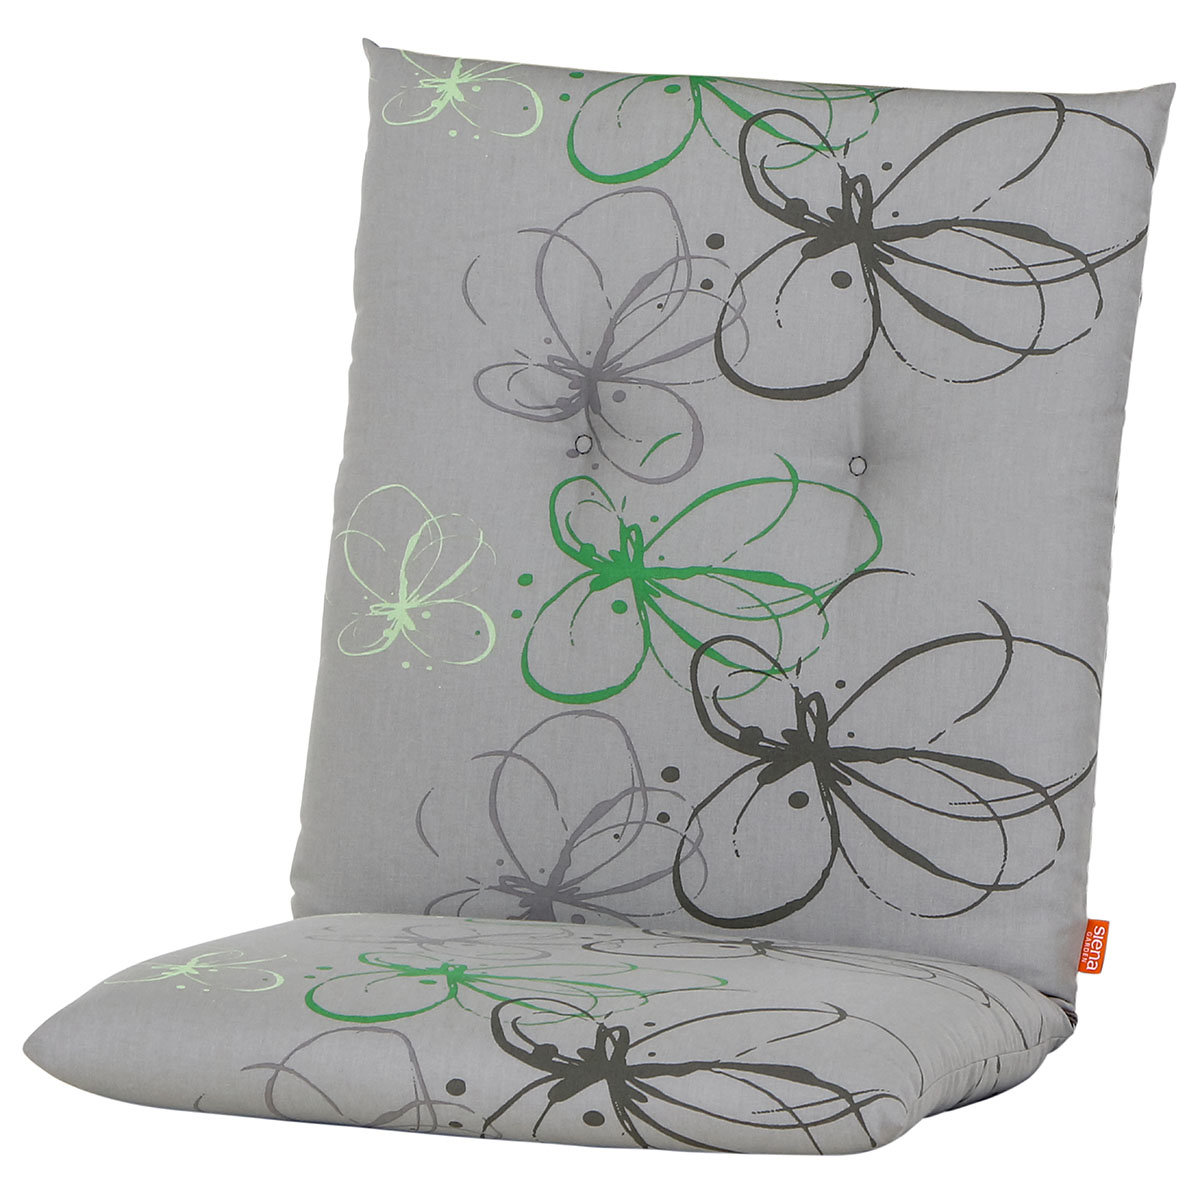 Sessel-Auflage Gabi, grüne Blume